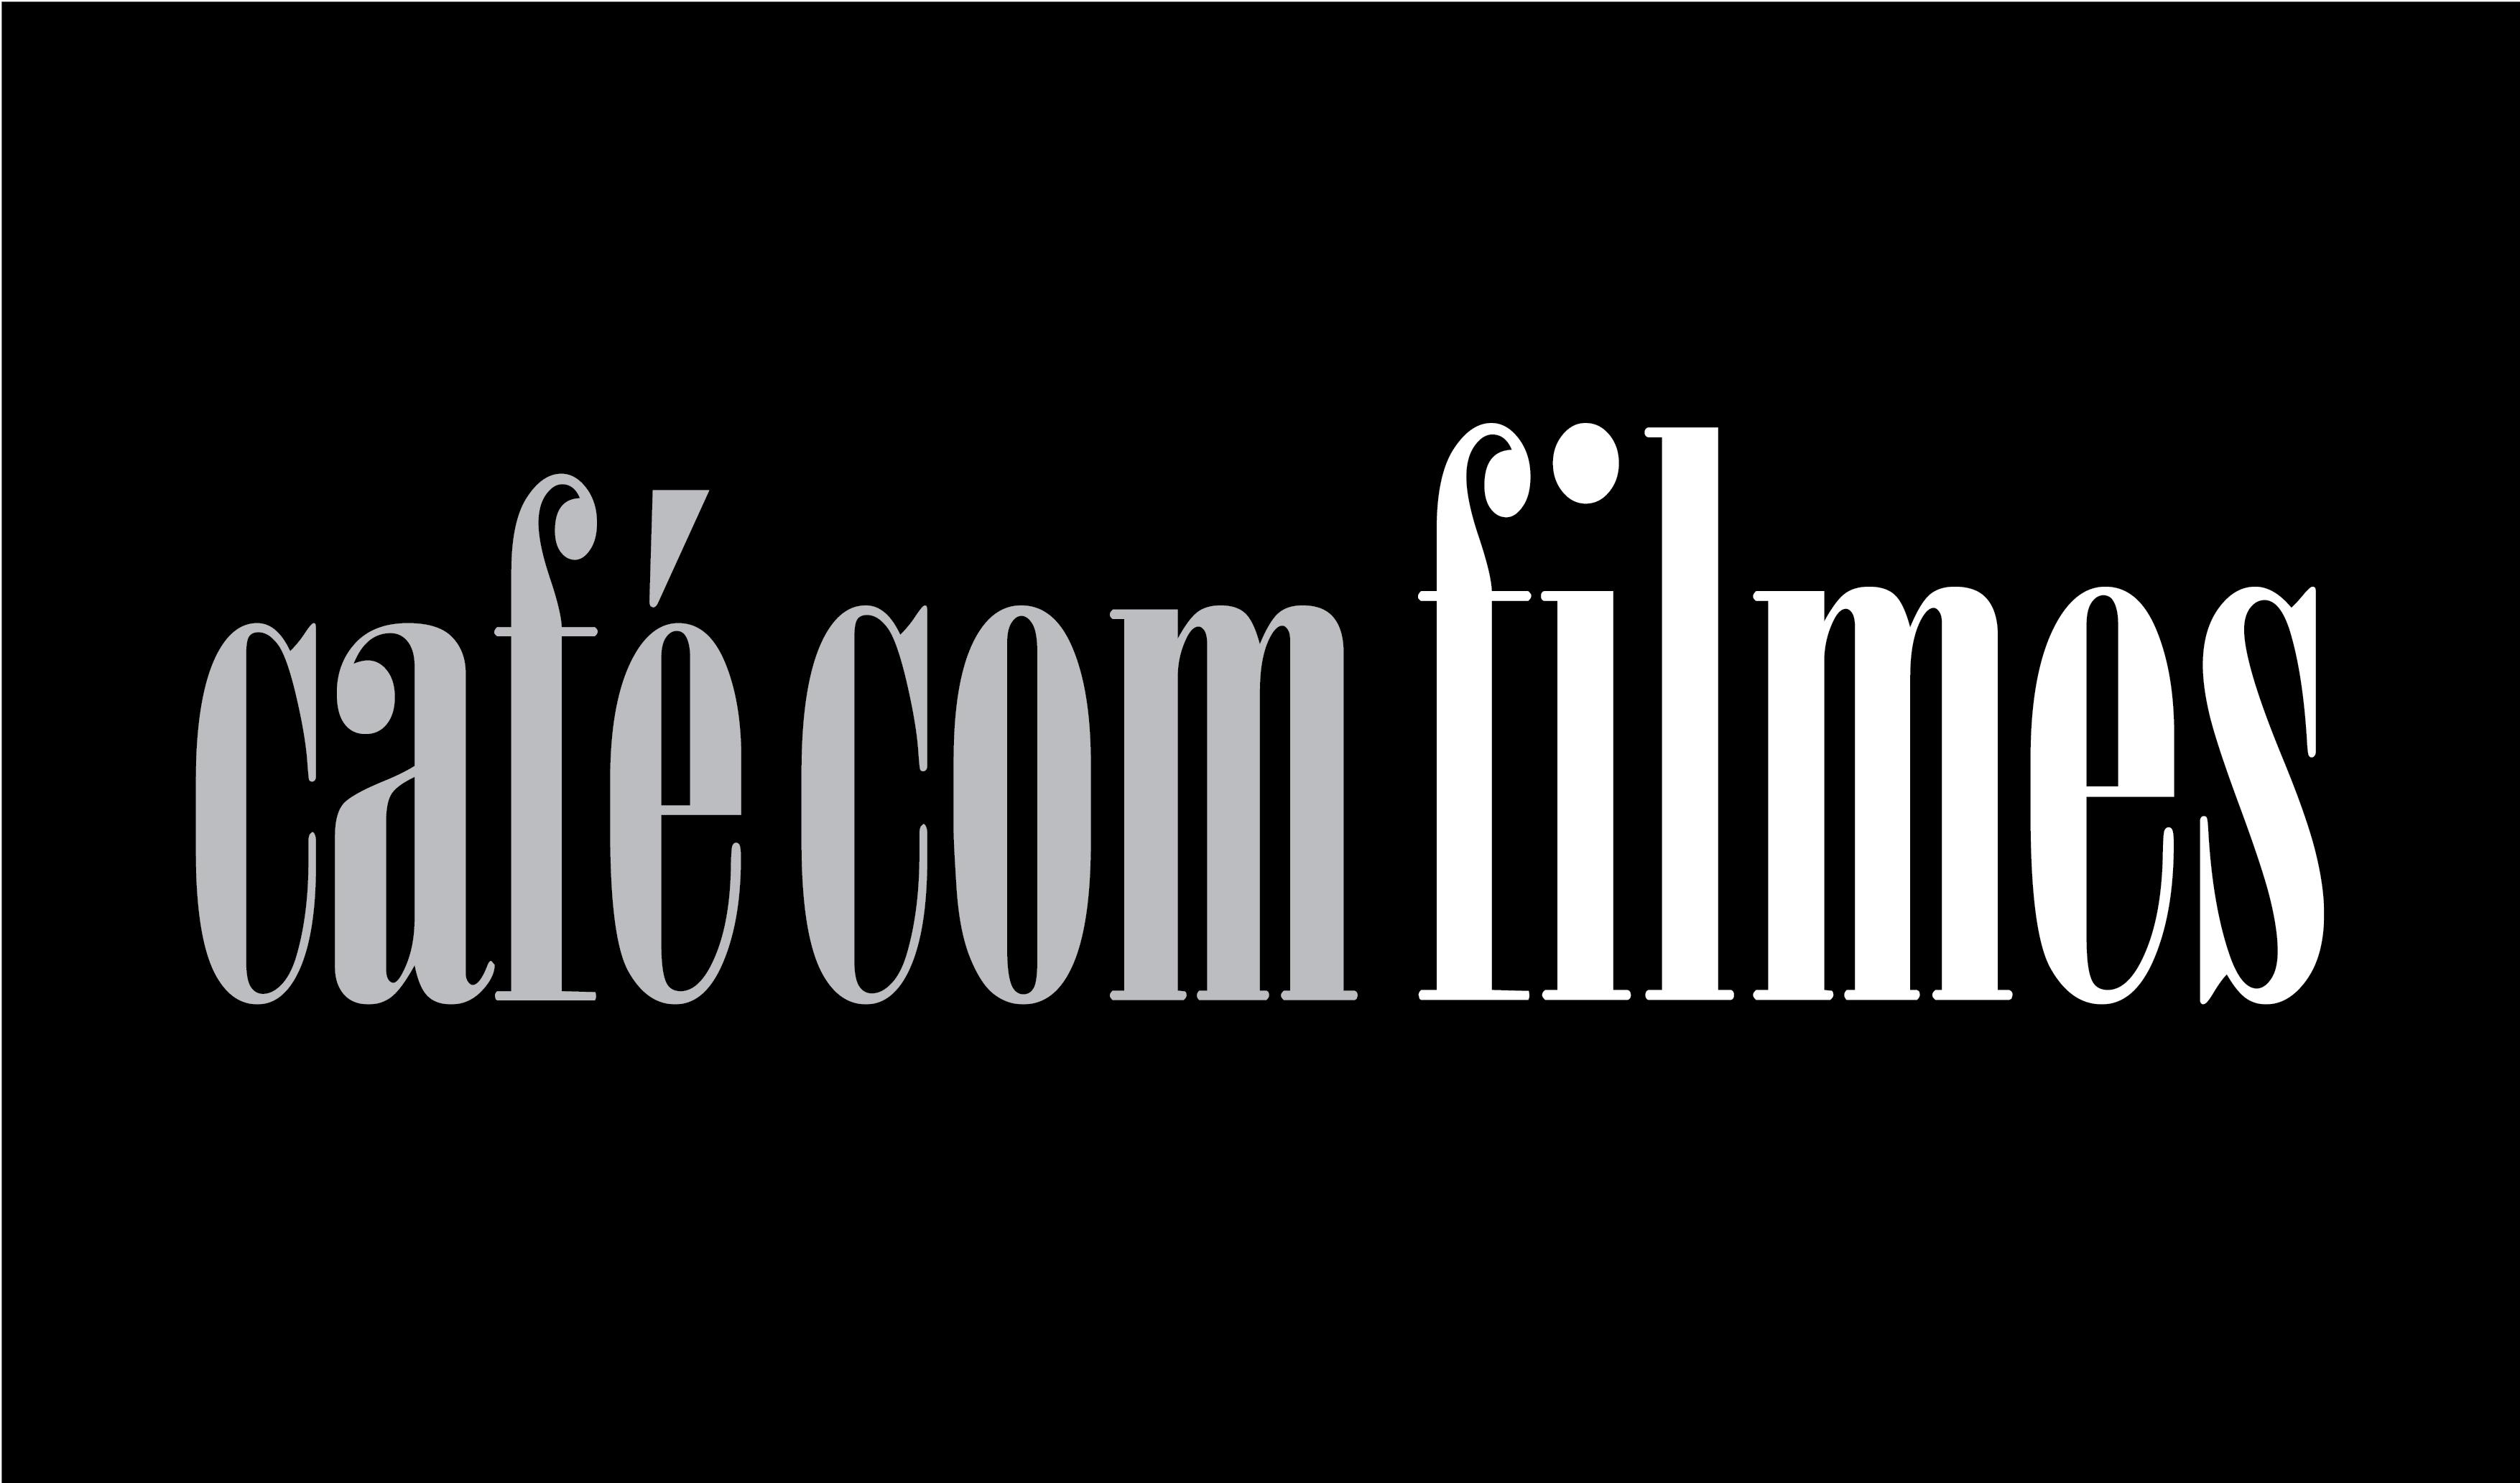 logo_horizontal-01.jpg